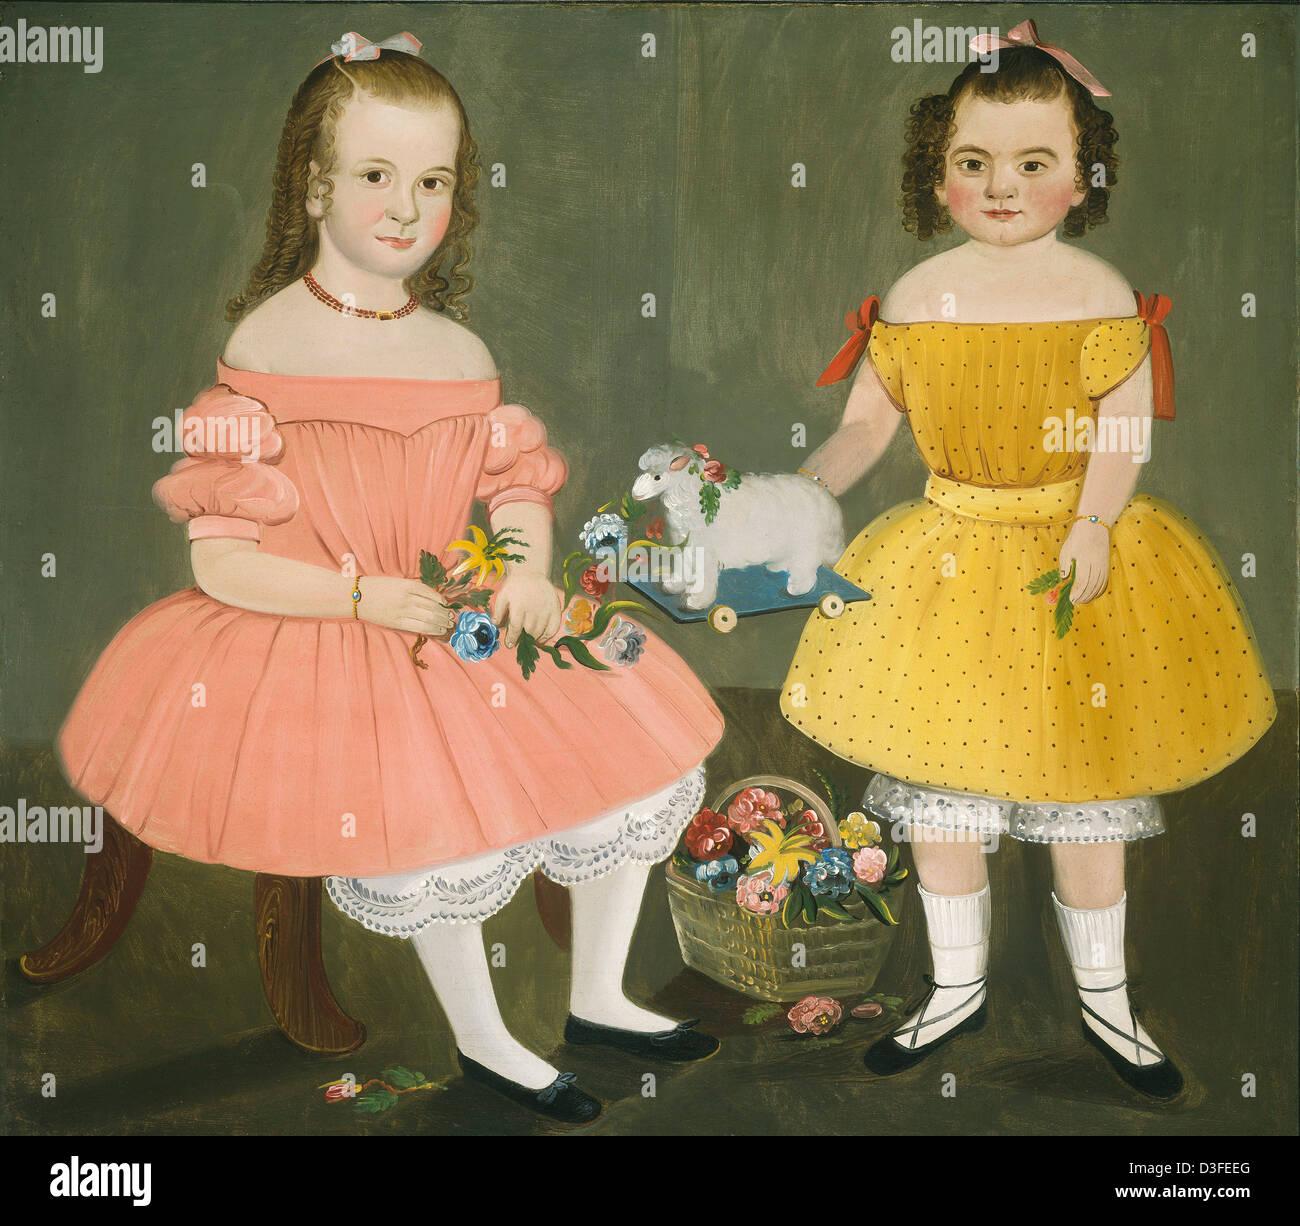 William Matthew Prior, The Burnish Sisters, American, 1806 - 1873, 1854, oil on canvas - Stock Image